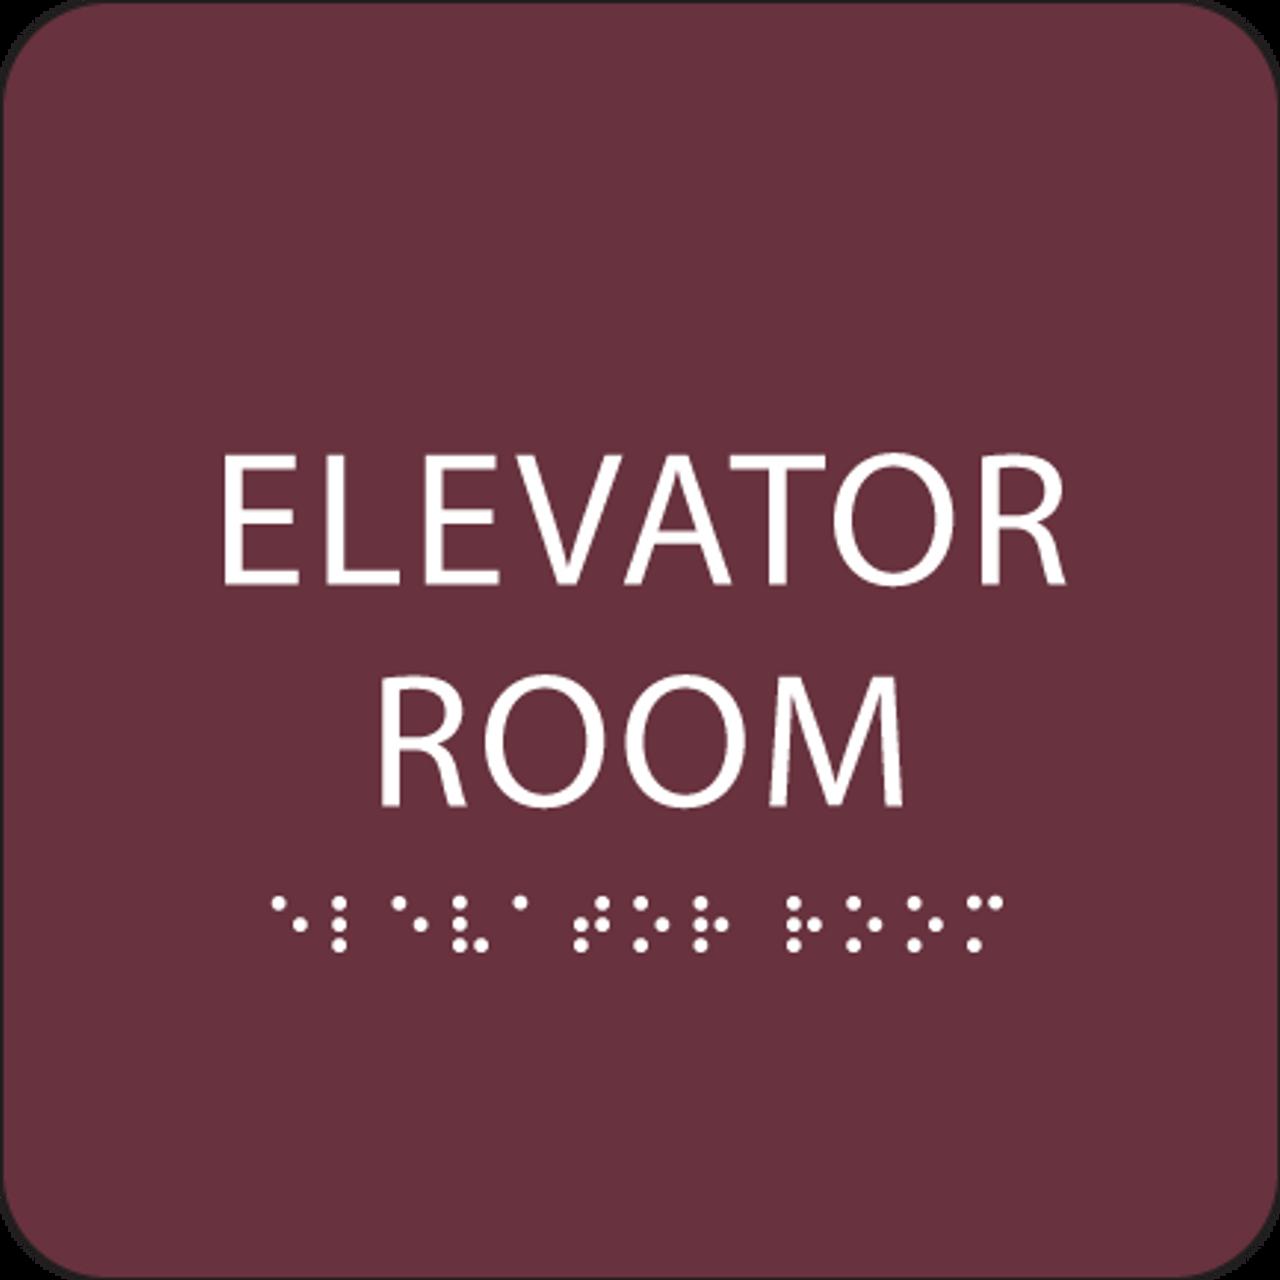 "Elevator Room ADA Sign - 6"" x 6"""